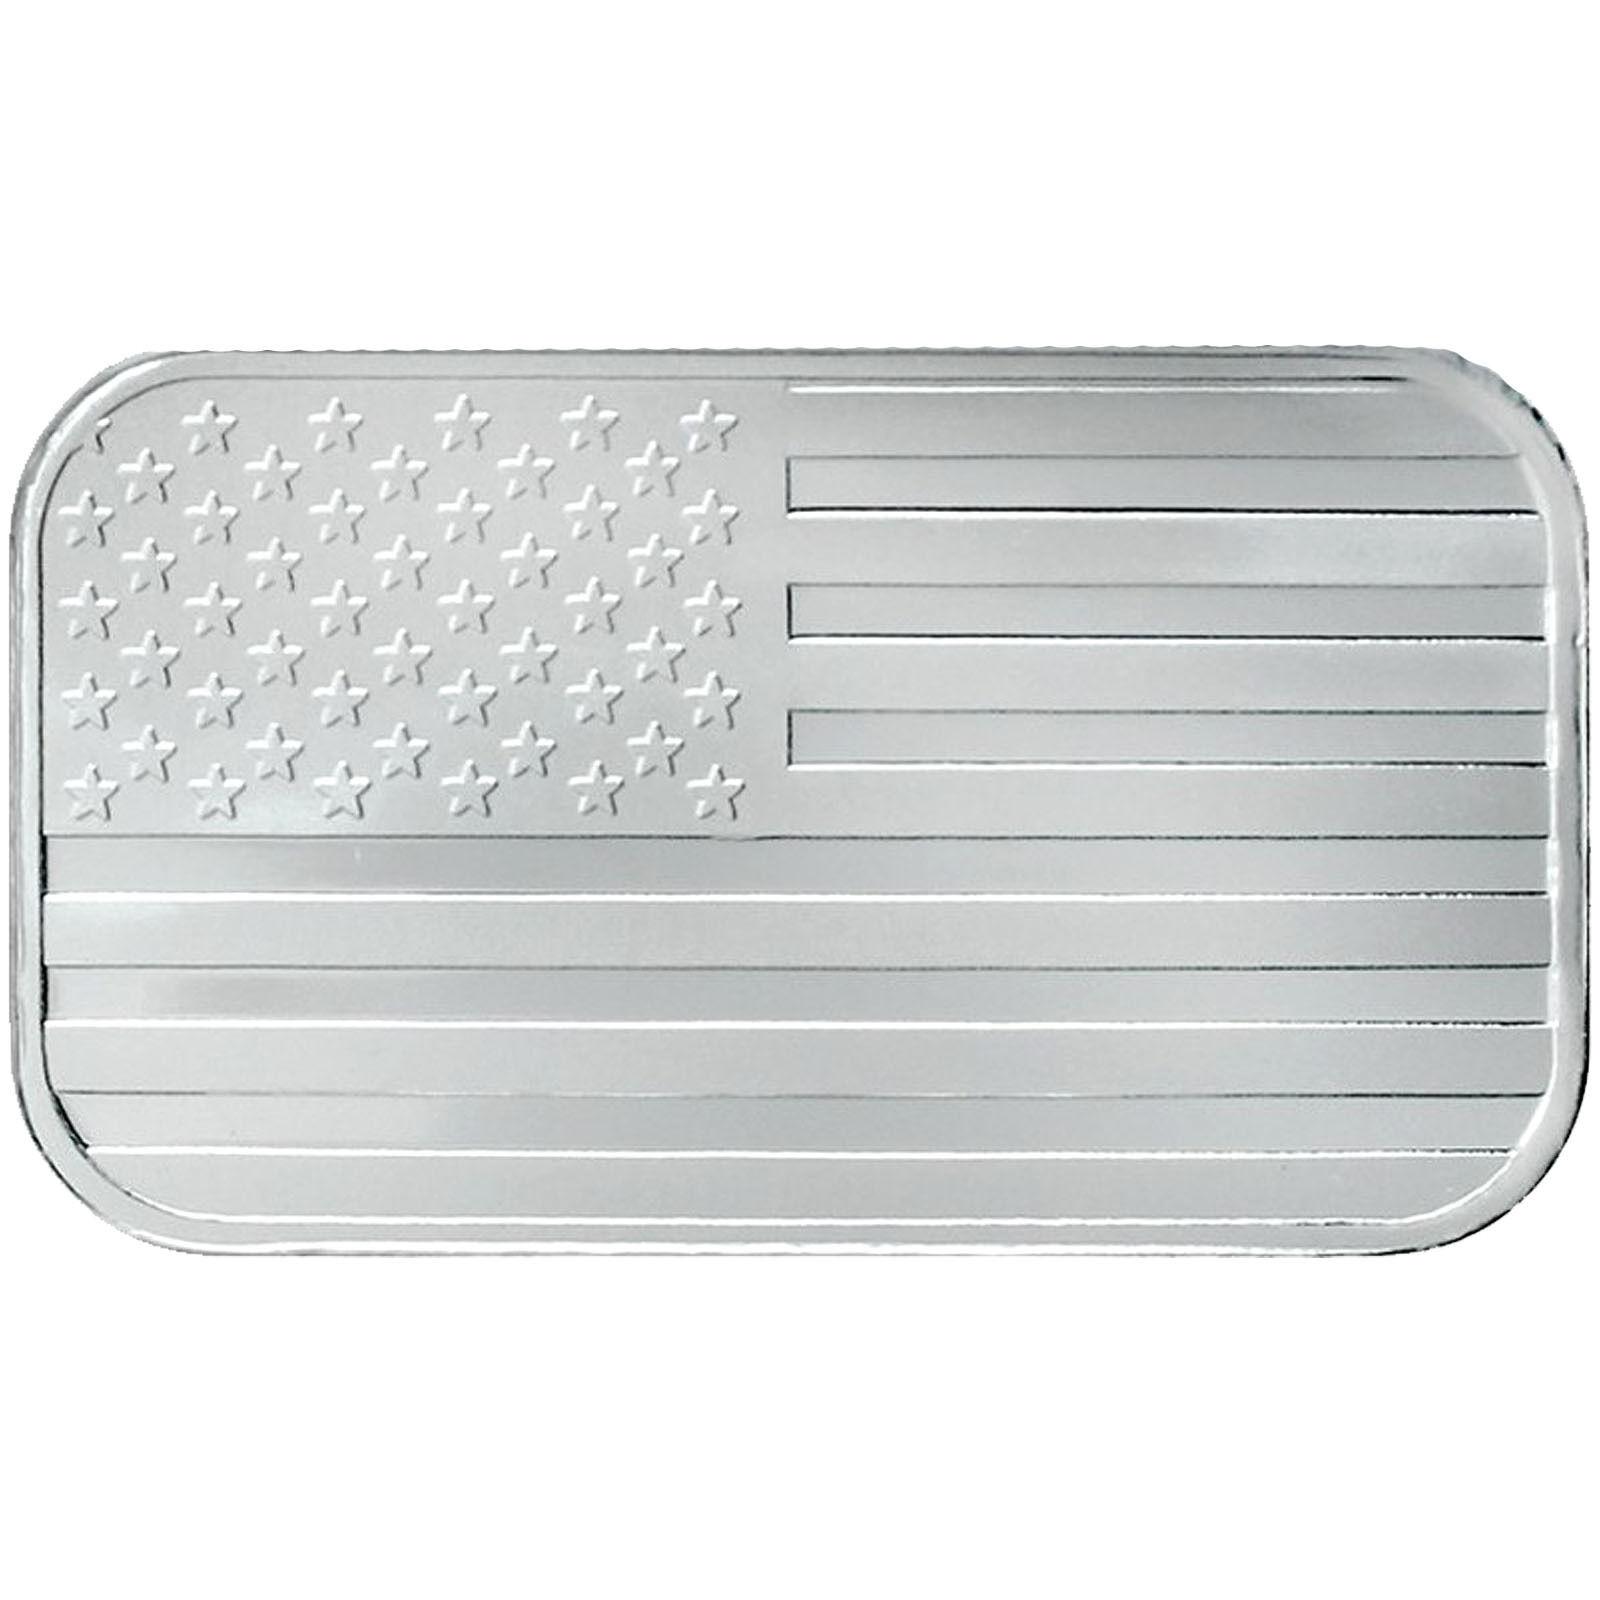 American Flag 1oz .999 Fine Silver Bar by SilverTowne LOT of 500